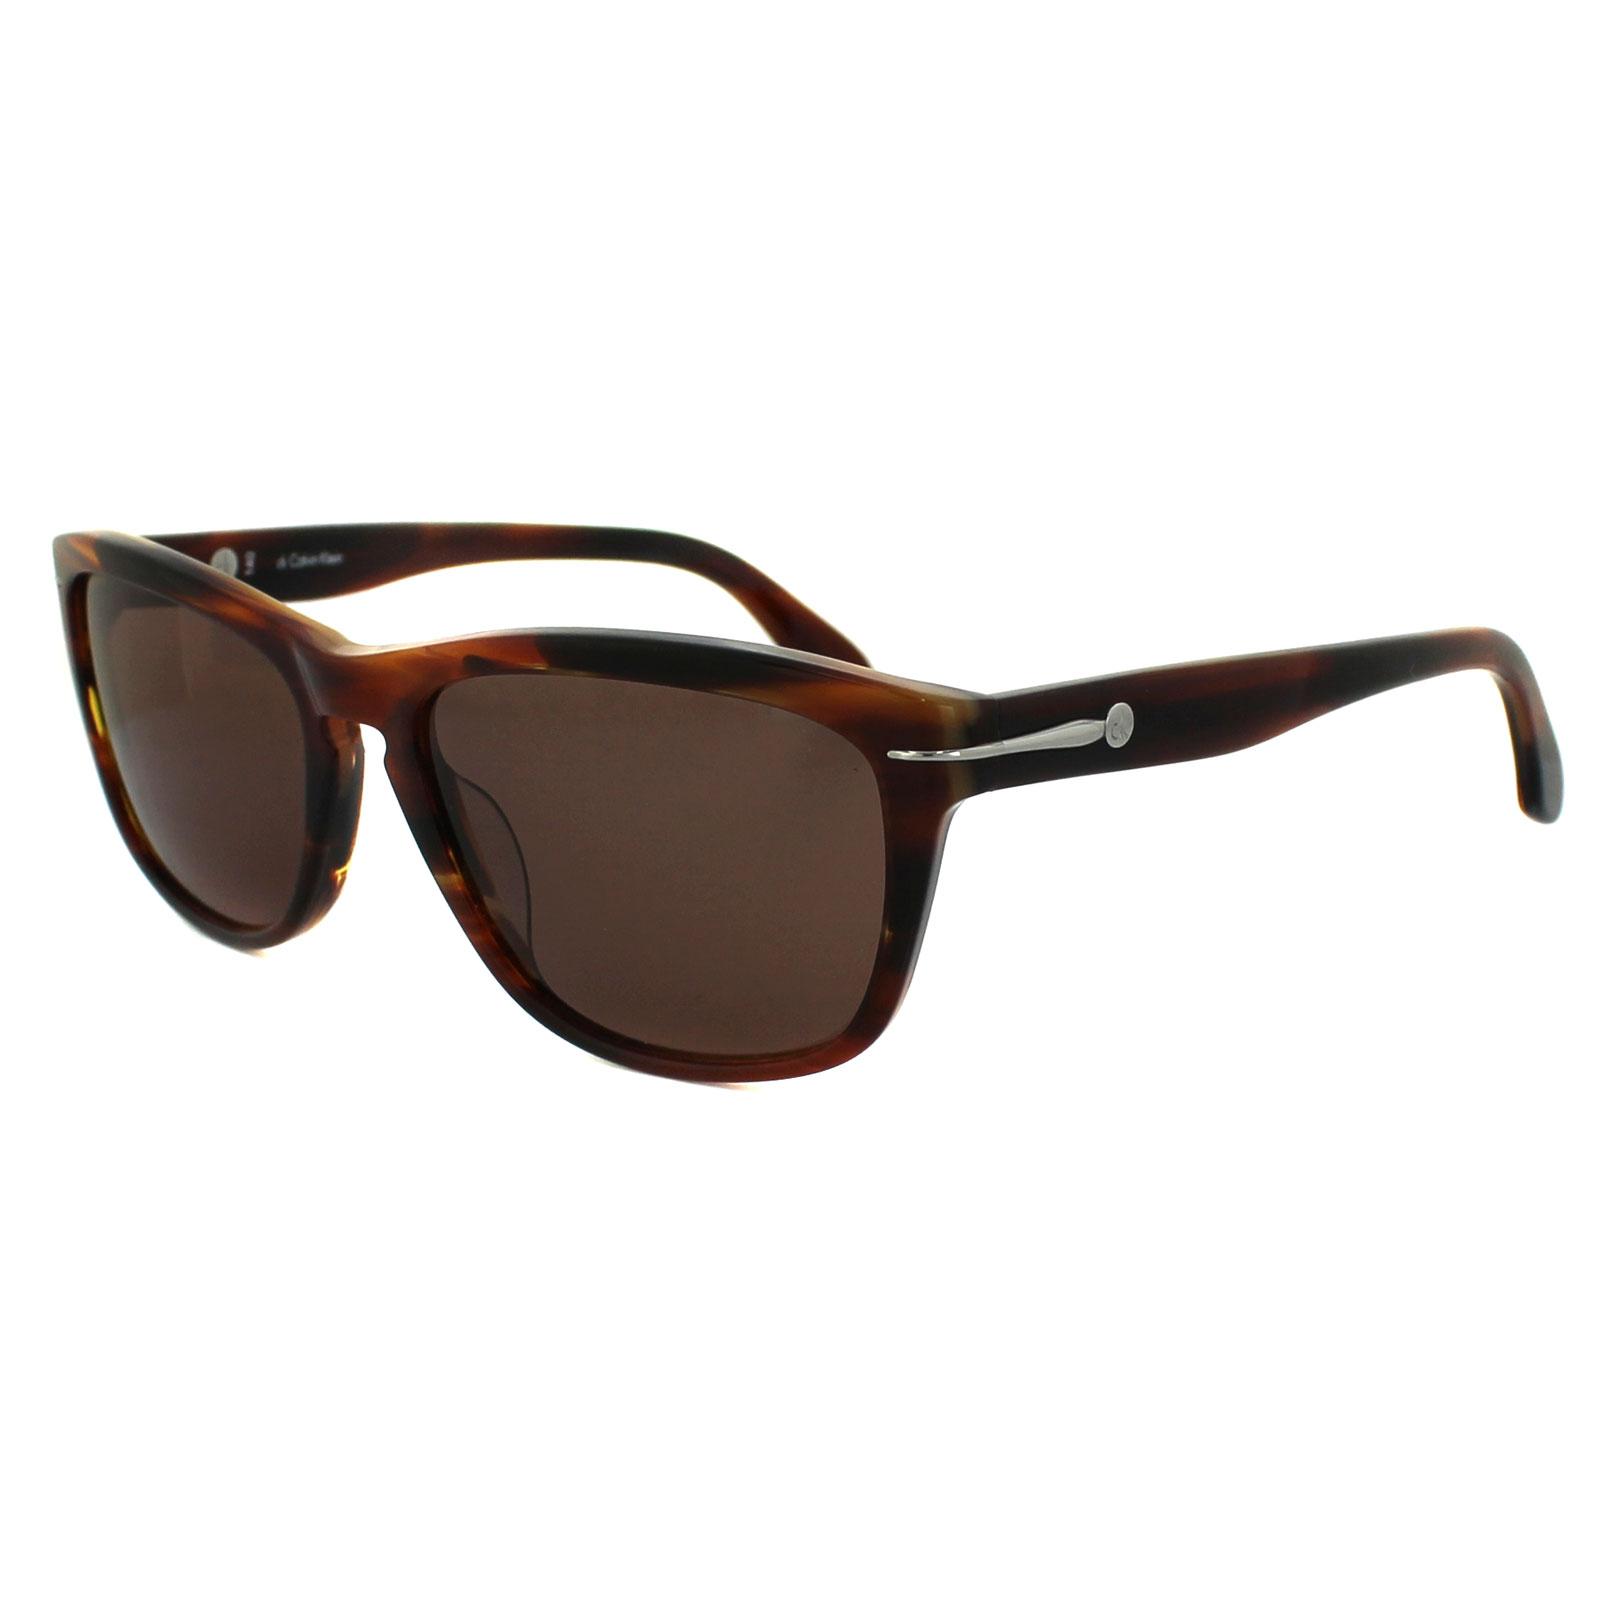 Calvin Klein Sunglasses 4218 021 Havana Brown | eBay